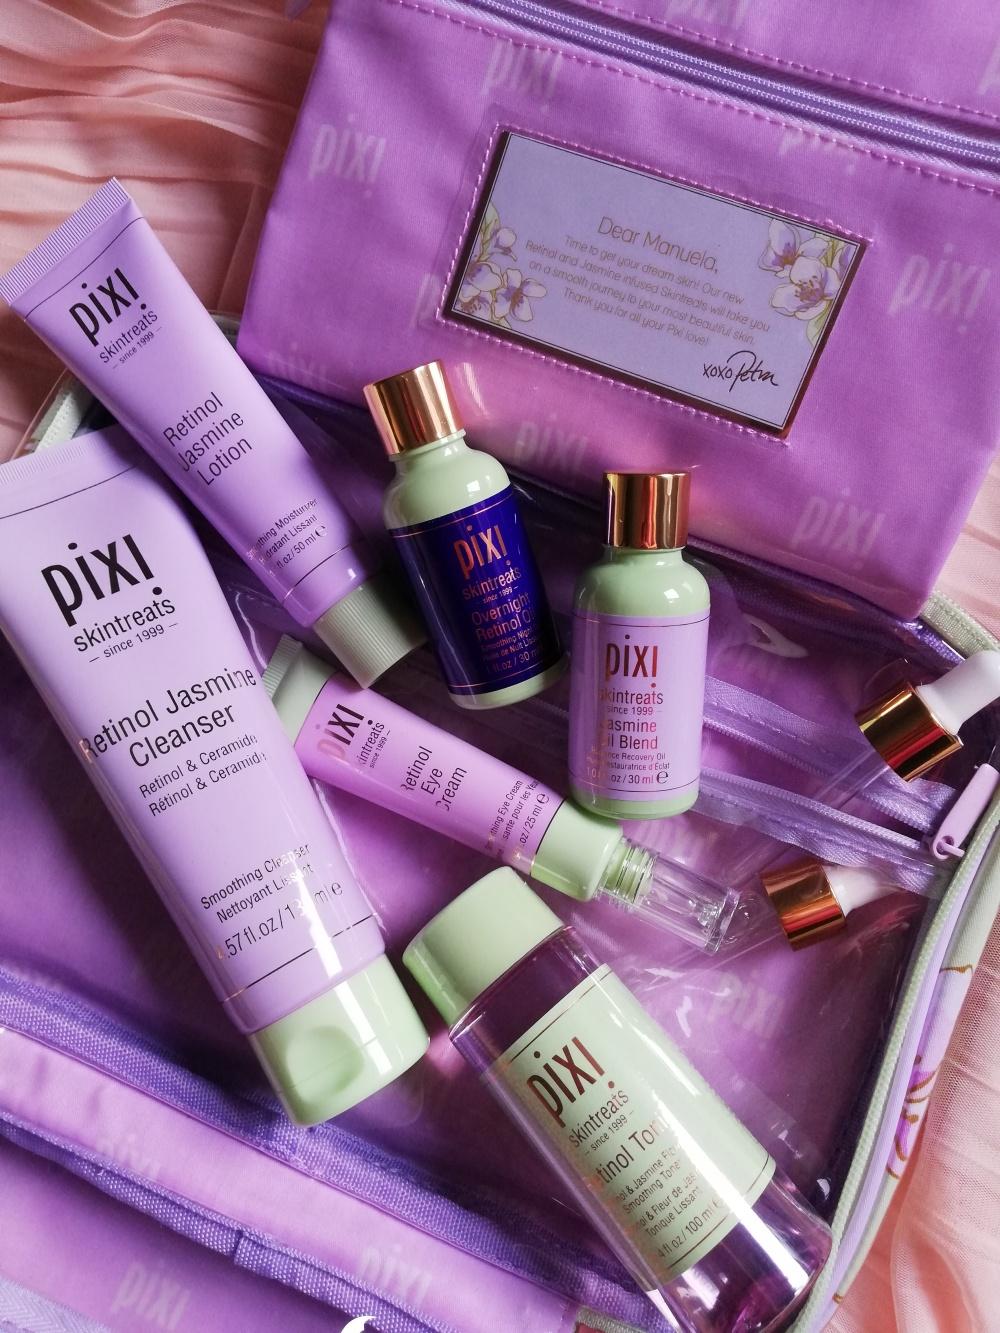 Pixi beauty nuova linea skincare da Sephora